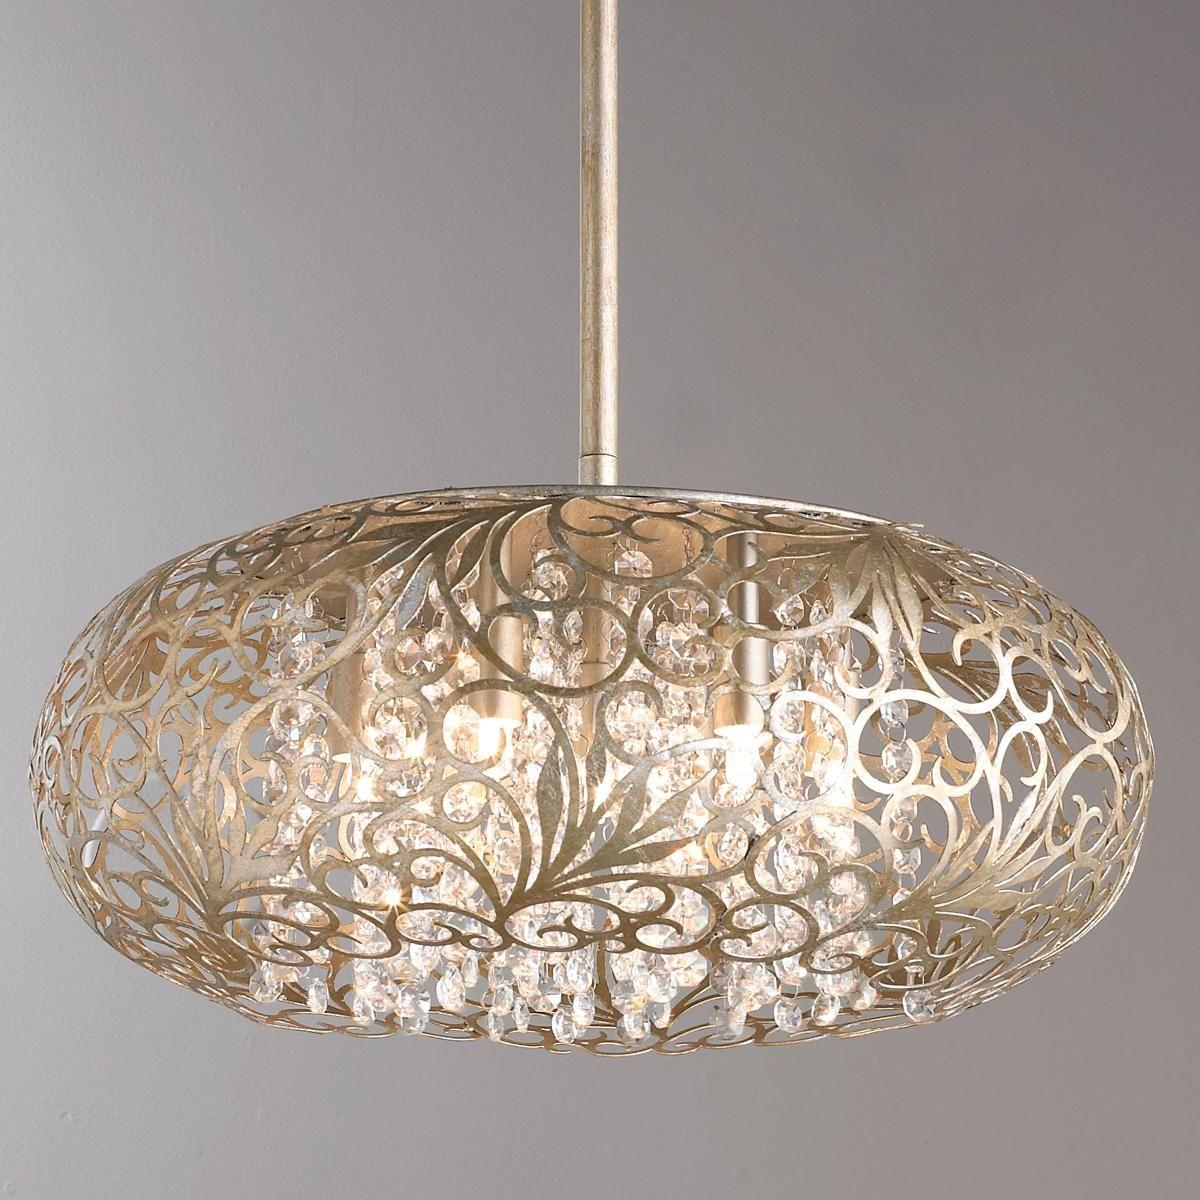 Arabesque Crystal Pendant Chandelier Pendant Chandelier Pendant Light Dome Pendant Lighting